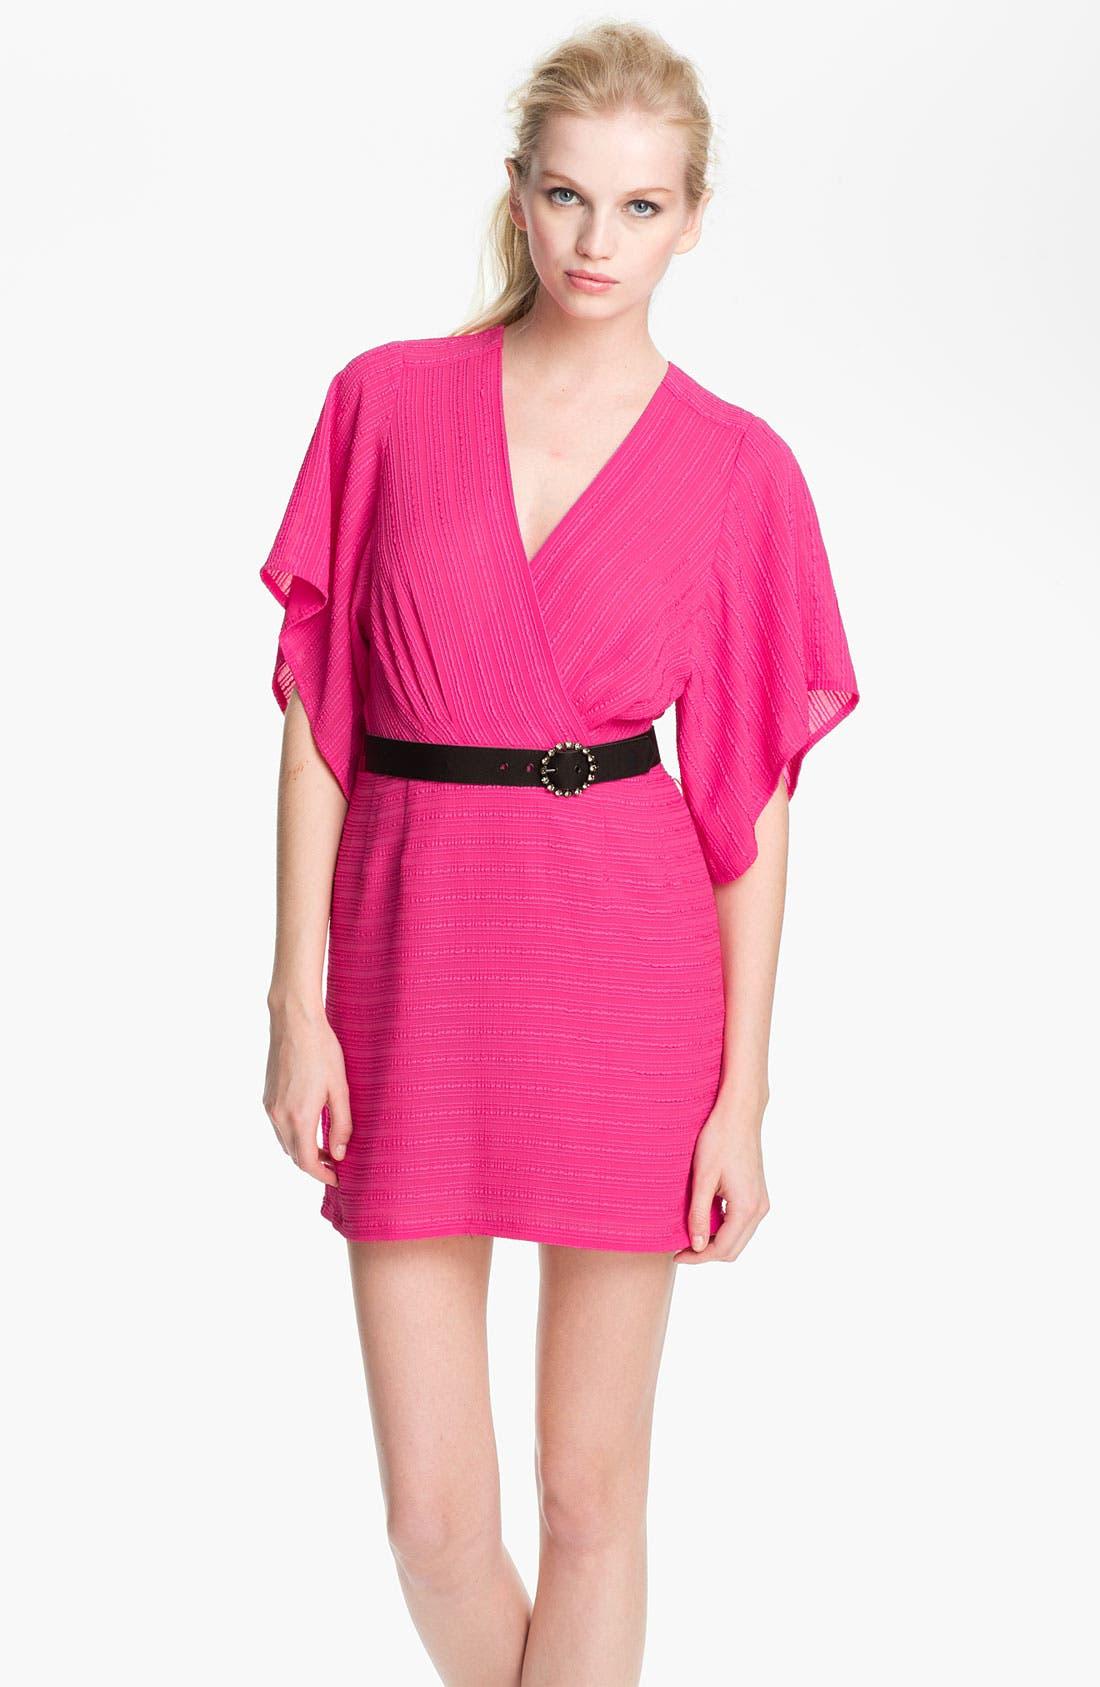 Main Image - Nanette Lepore 'Geisha Girl' Crepe Surplice Dress